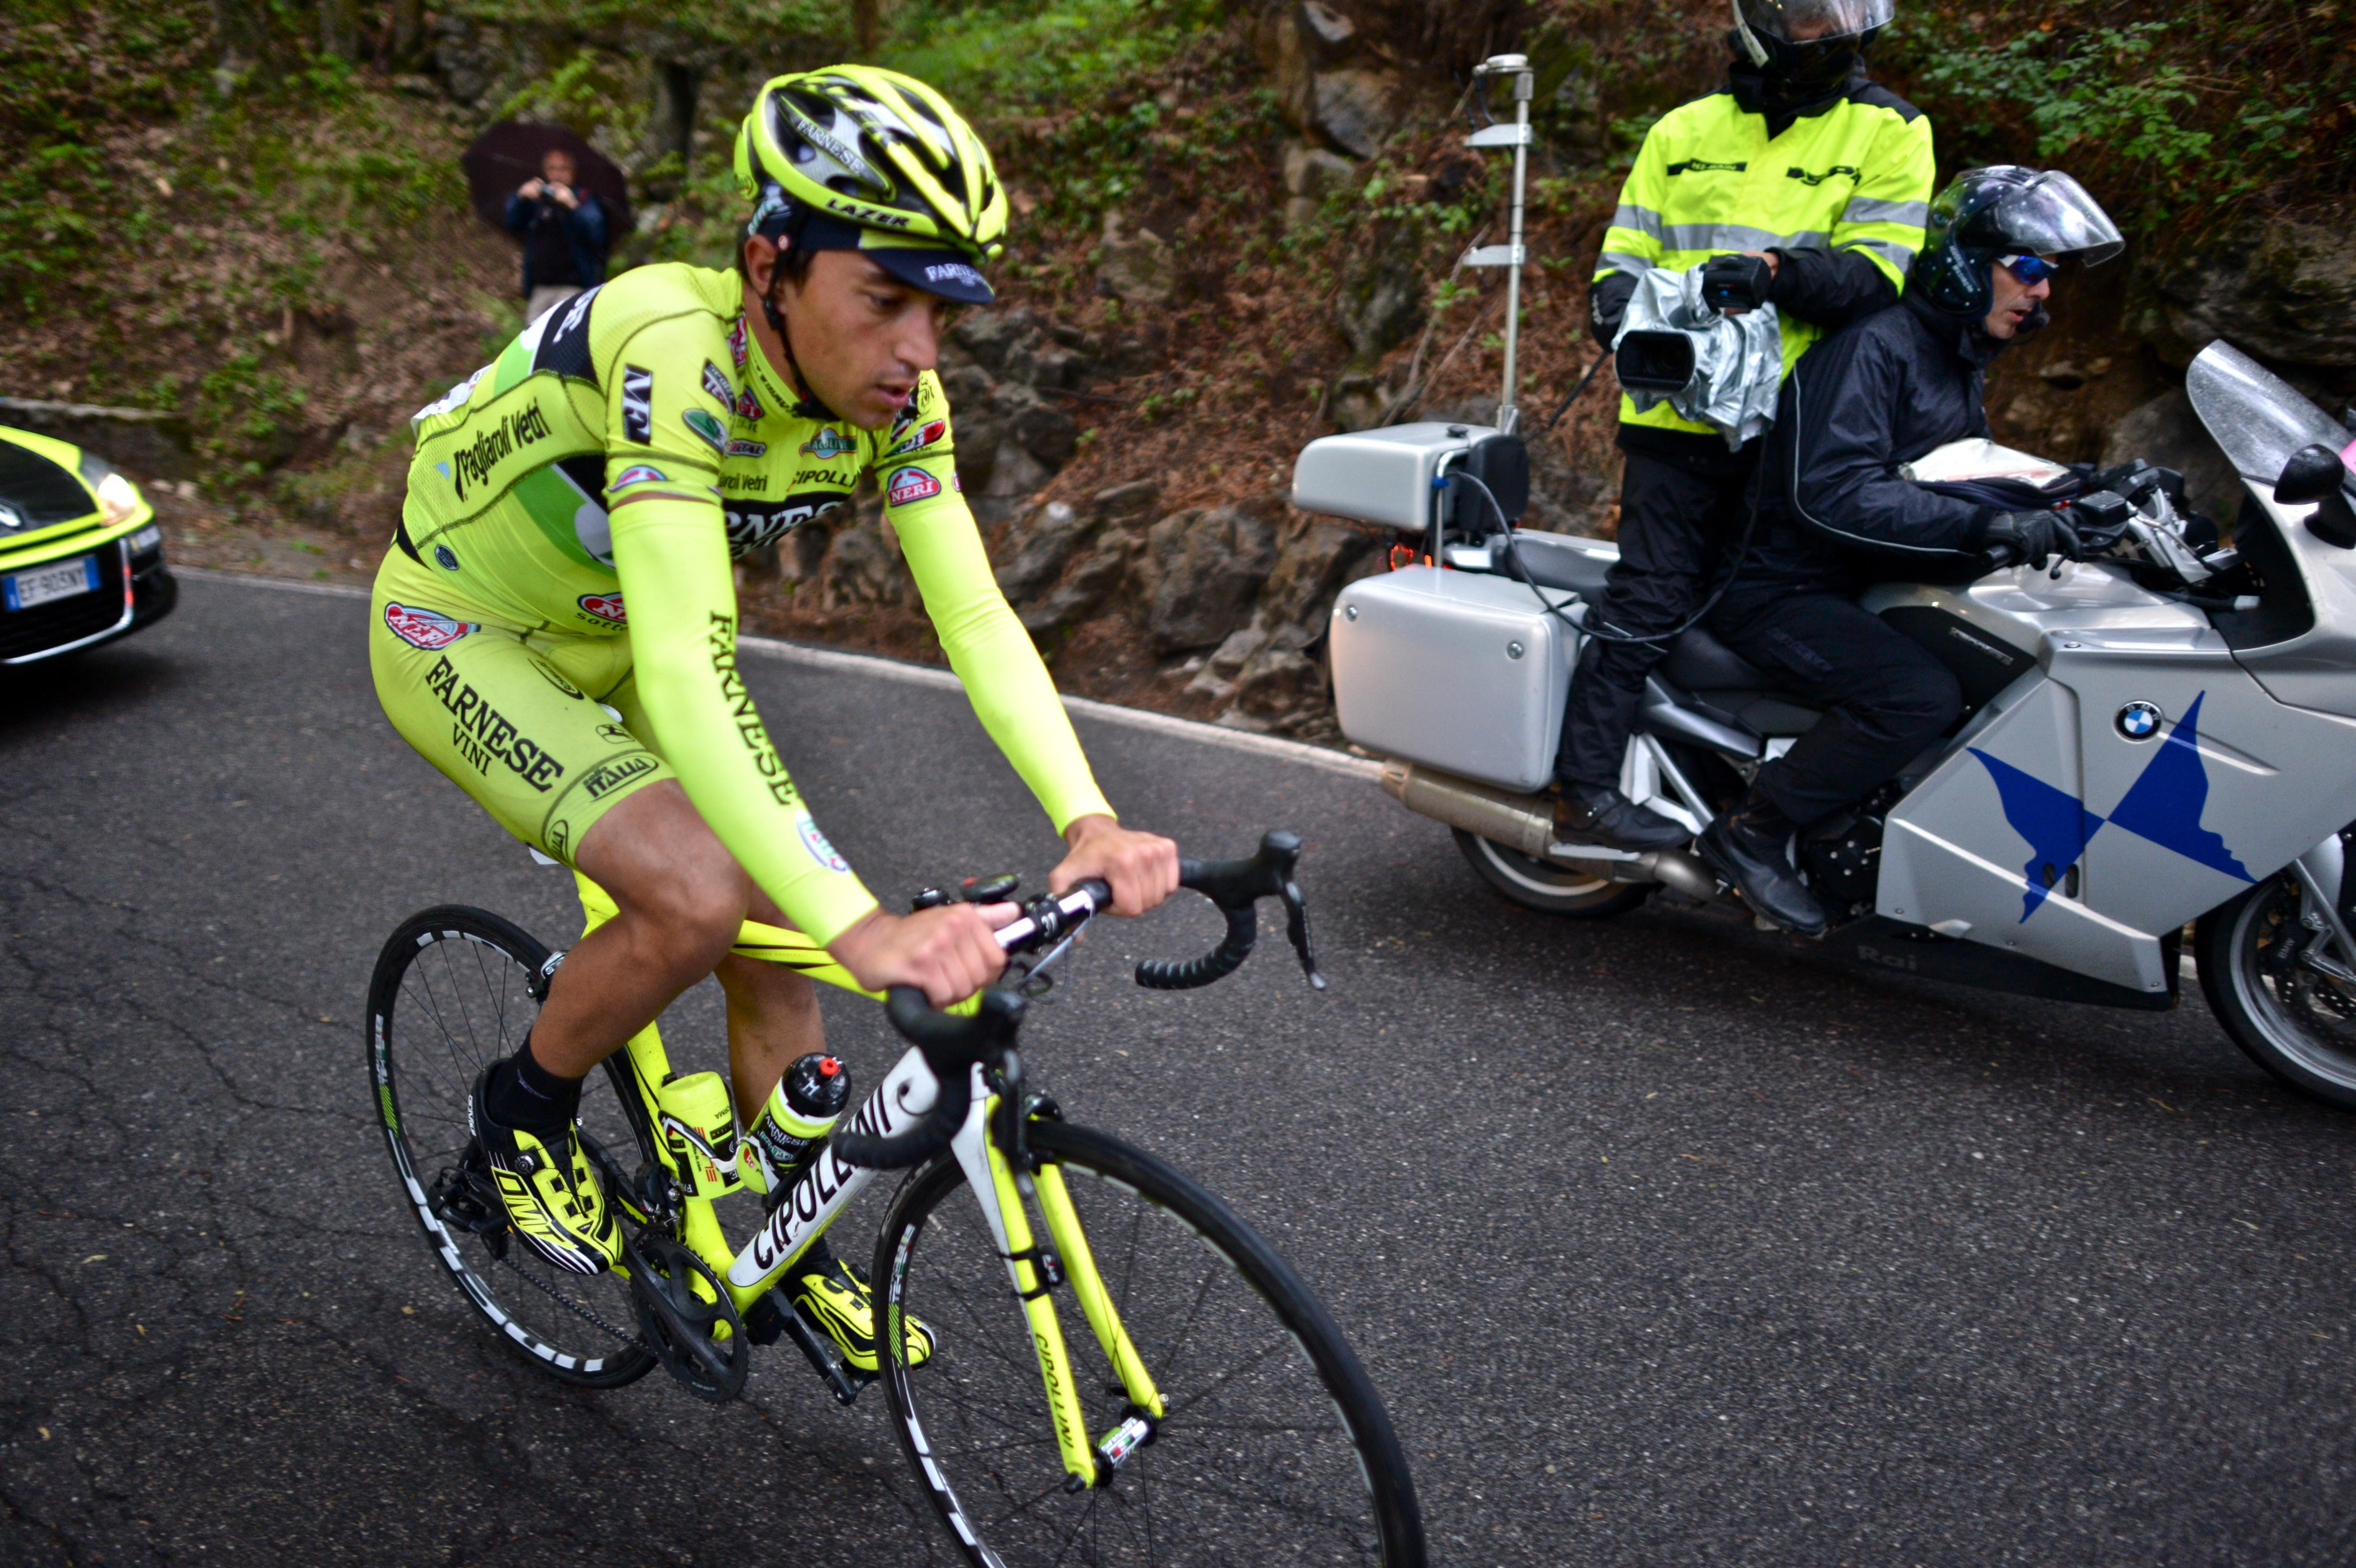 Doping: Rabottini positivo, salta la Nazionale